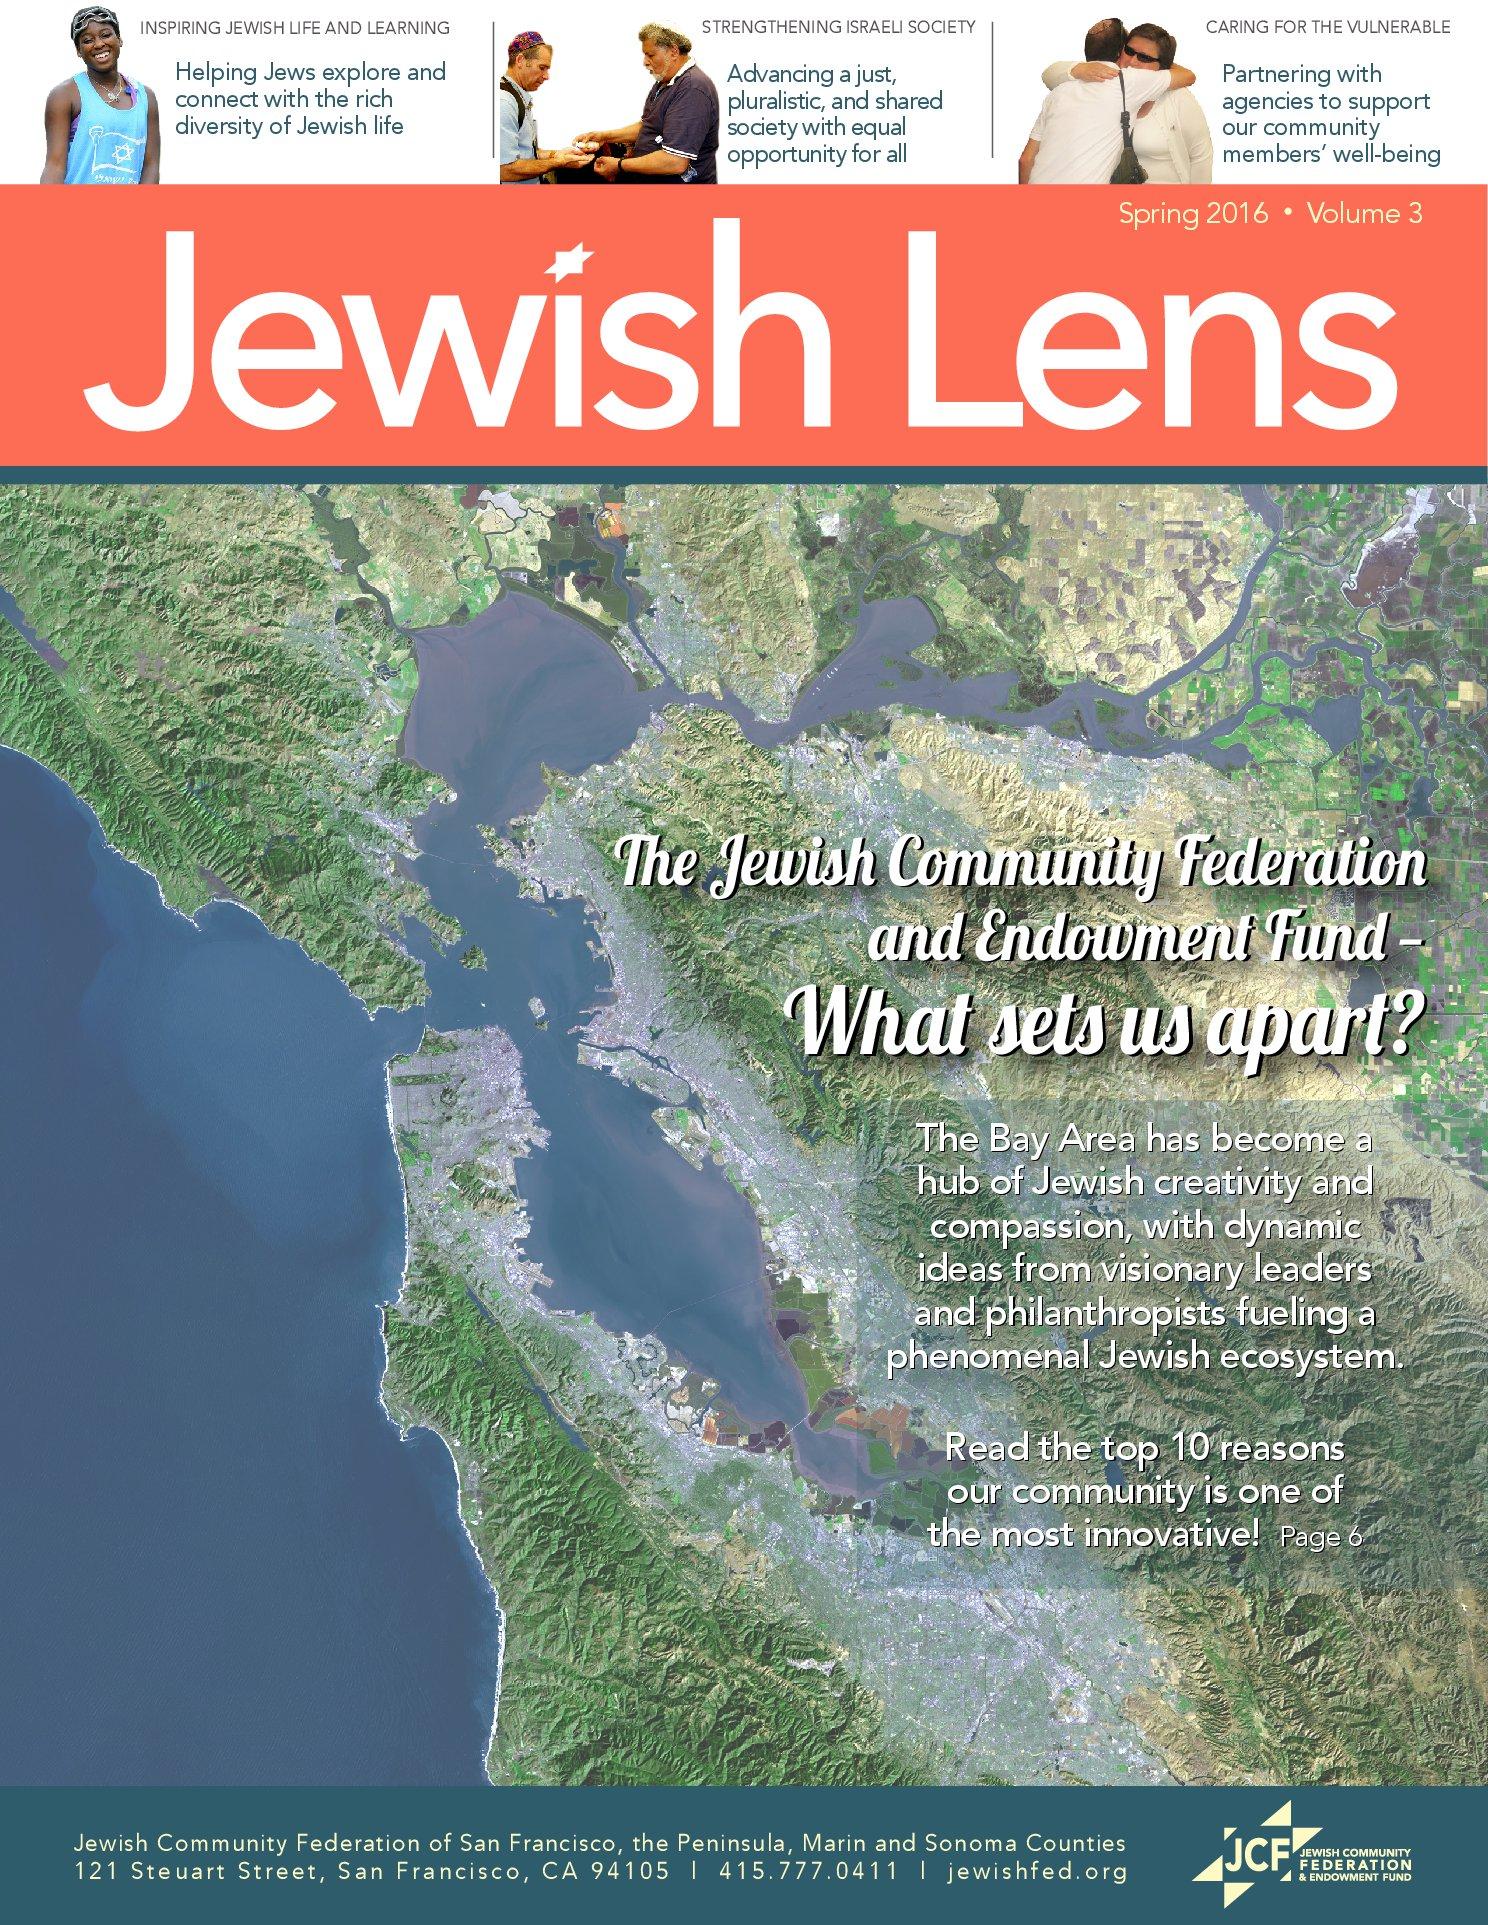 Jewish Lens by Jewish Community Federation of San Francisco